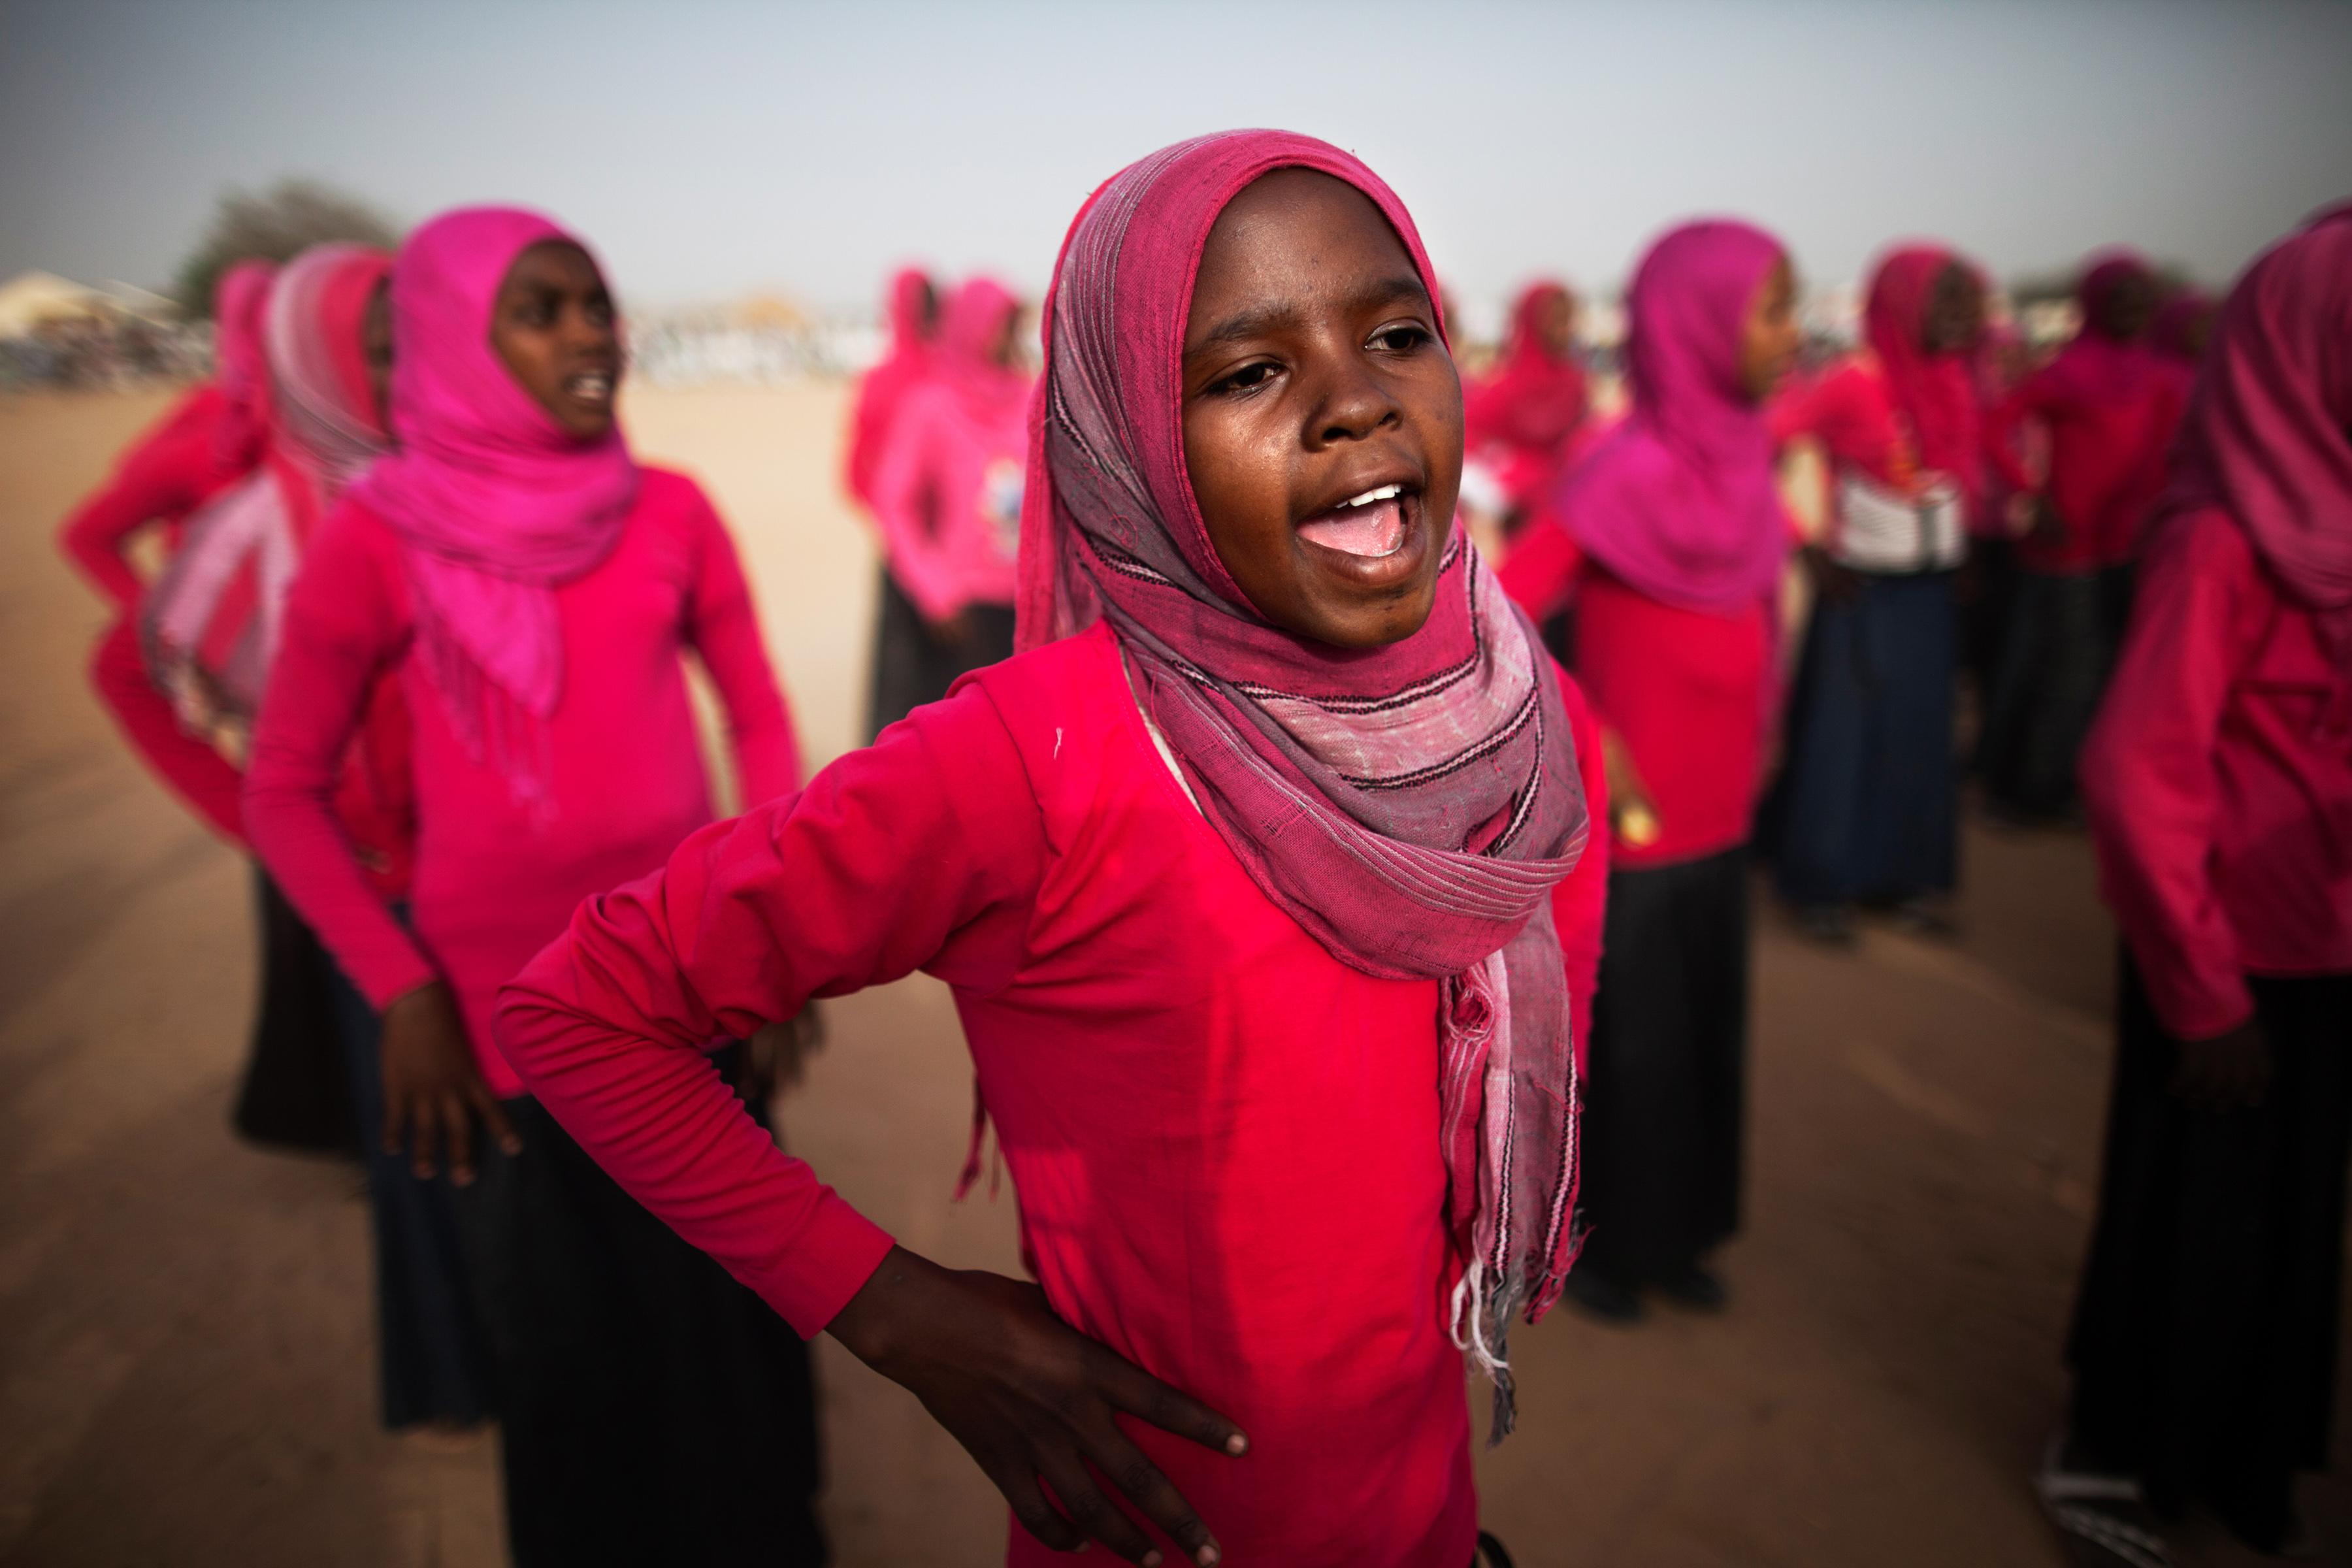 Foto: UNAMID/Albert Gonzalez Farran